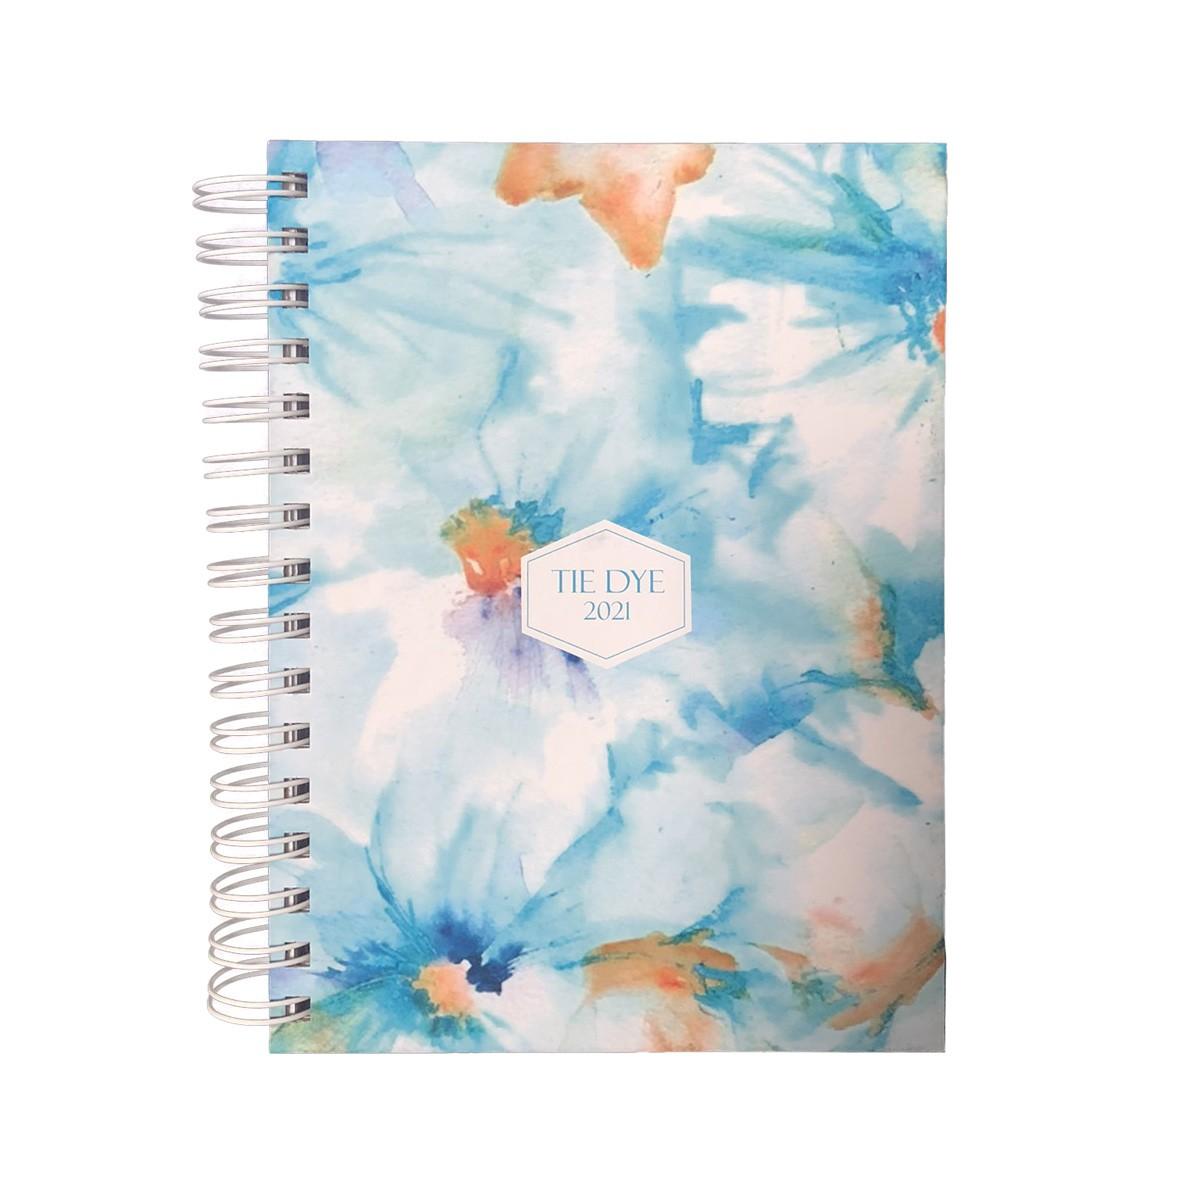 Agenda Pautada A5 168fls 2021 Tie Dye Flower Blue doSul